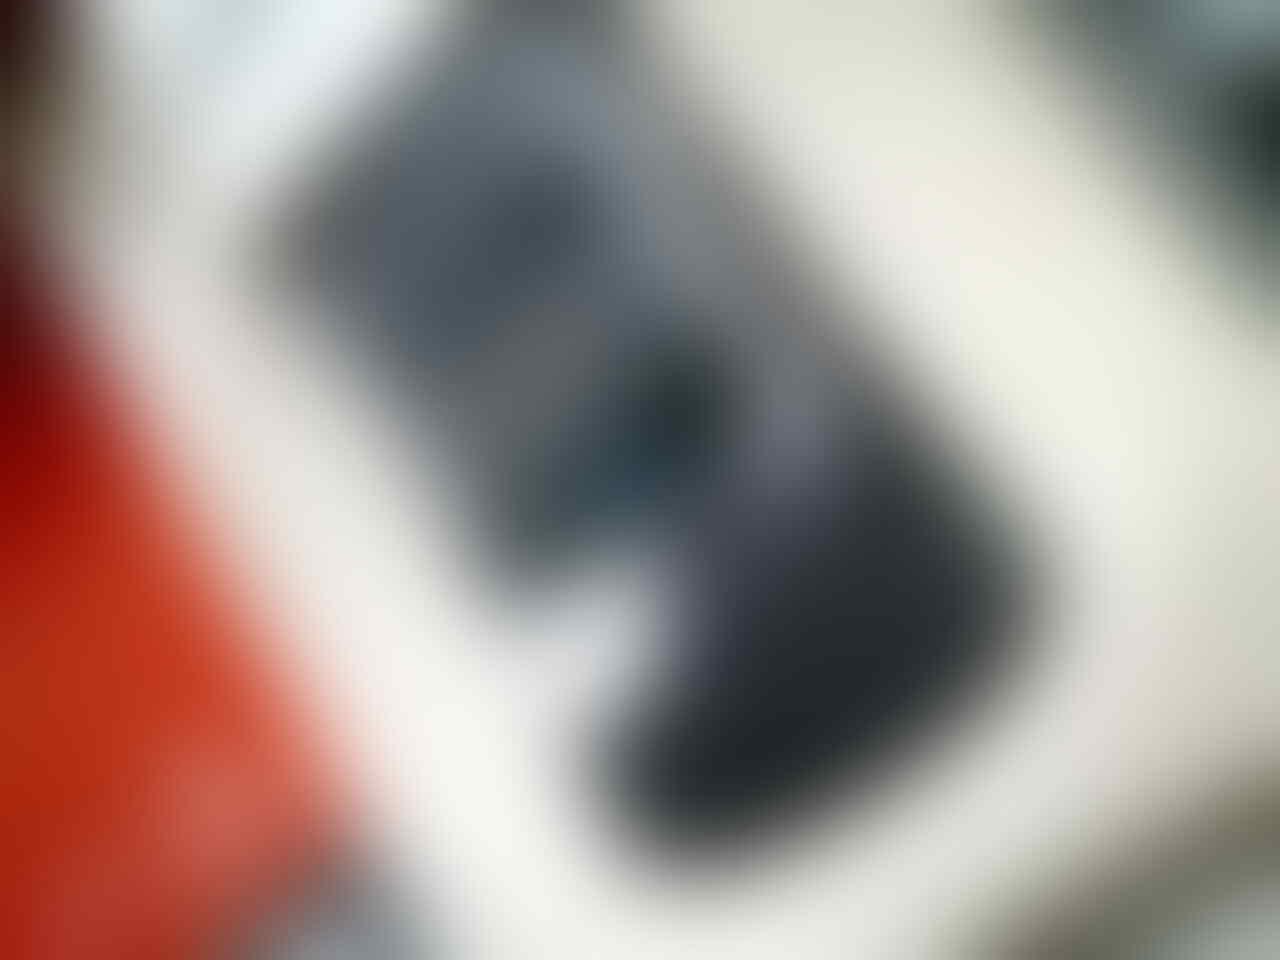 = RE-Stock Lagii Motorola RAZR V3i Gold Colour NOS Moto Indo !